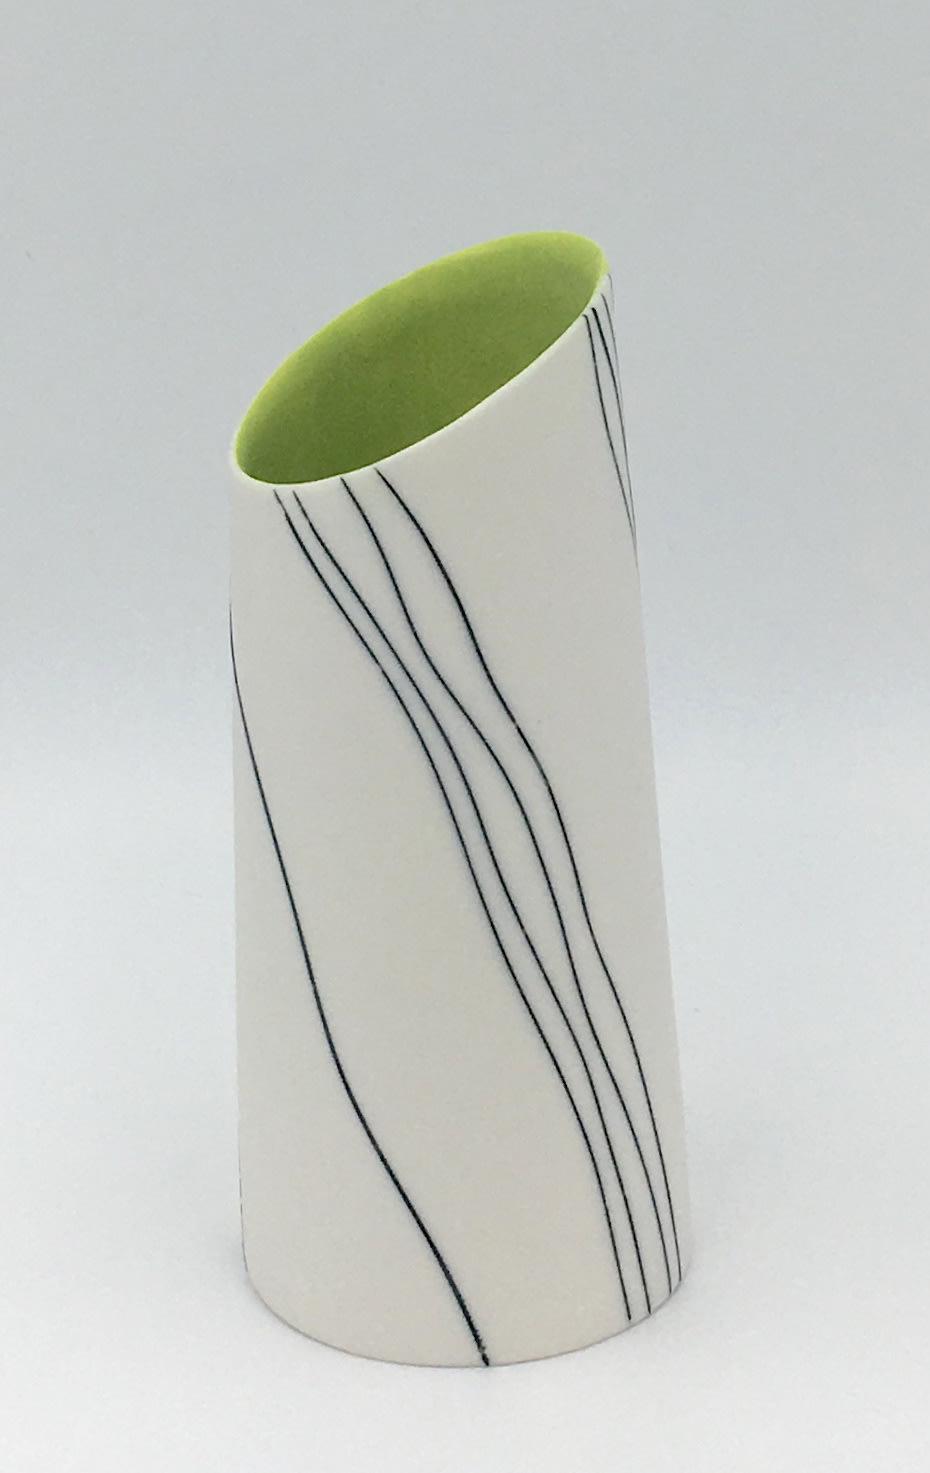 "<span class=""link fancybox-details-link""><a href=""/artists/195-lara-scobie/works/6533-lara-scobie-vase-with-tilted-rim-2019/"">View Detail Page</a></span><div class=""artist""><strong>Lara Scobie</strong></div> b. 1967 <div class=""title""><em>Vase with Tilted Rim</em>, 2019</div> <div class=""medium"">Porcelain</div>"